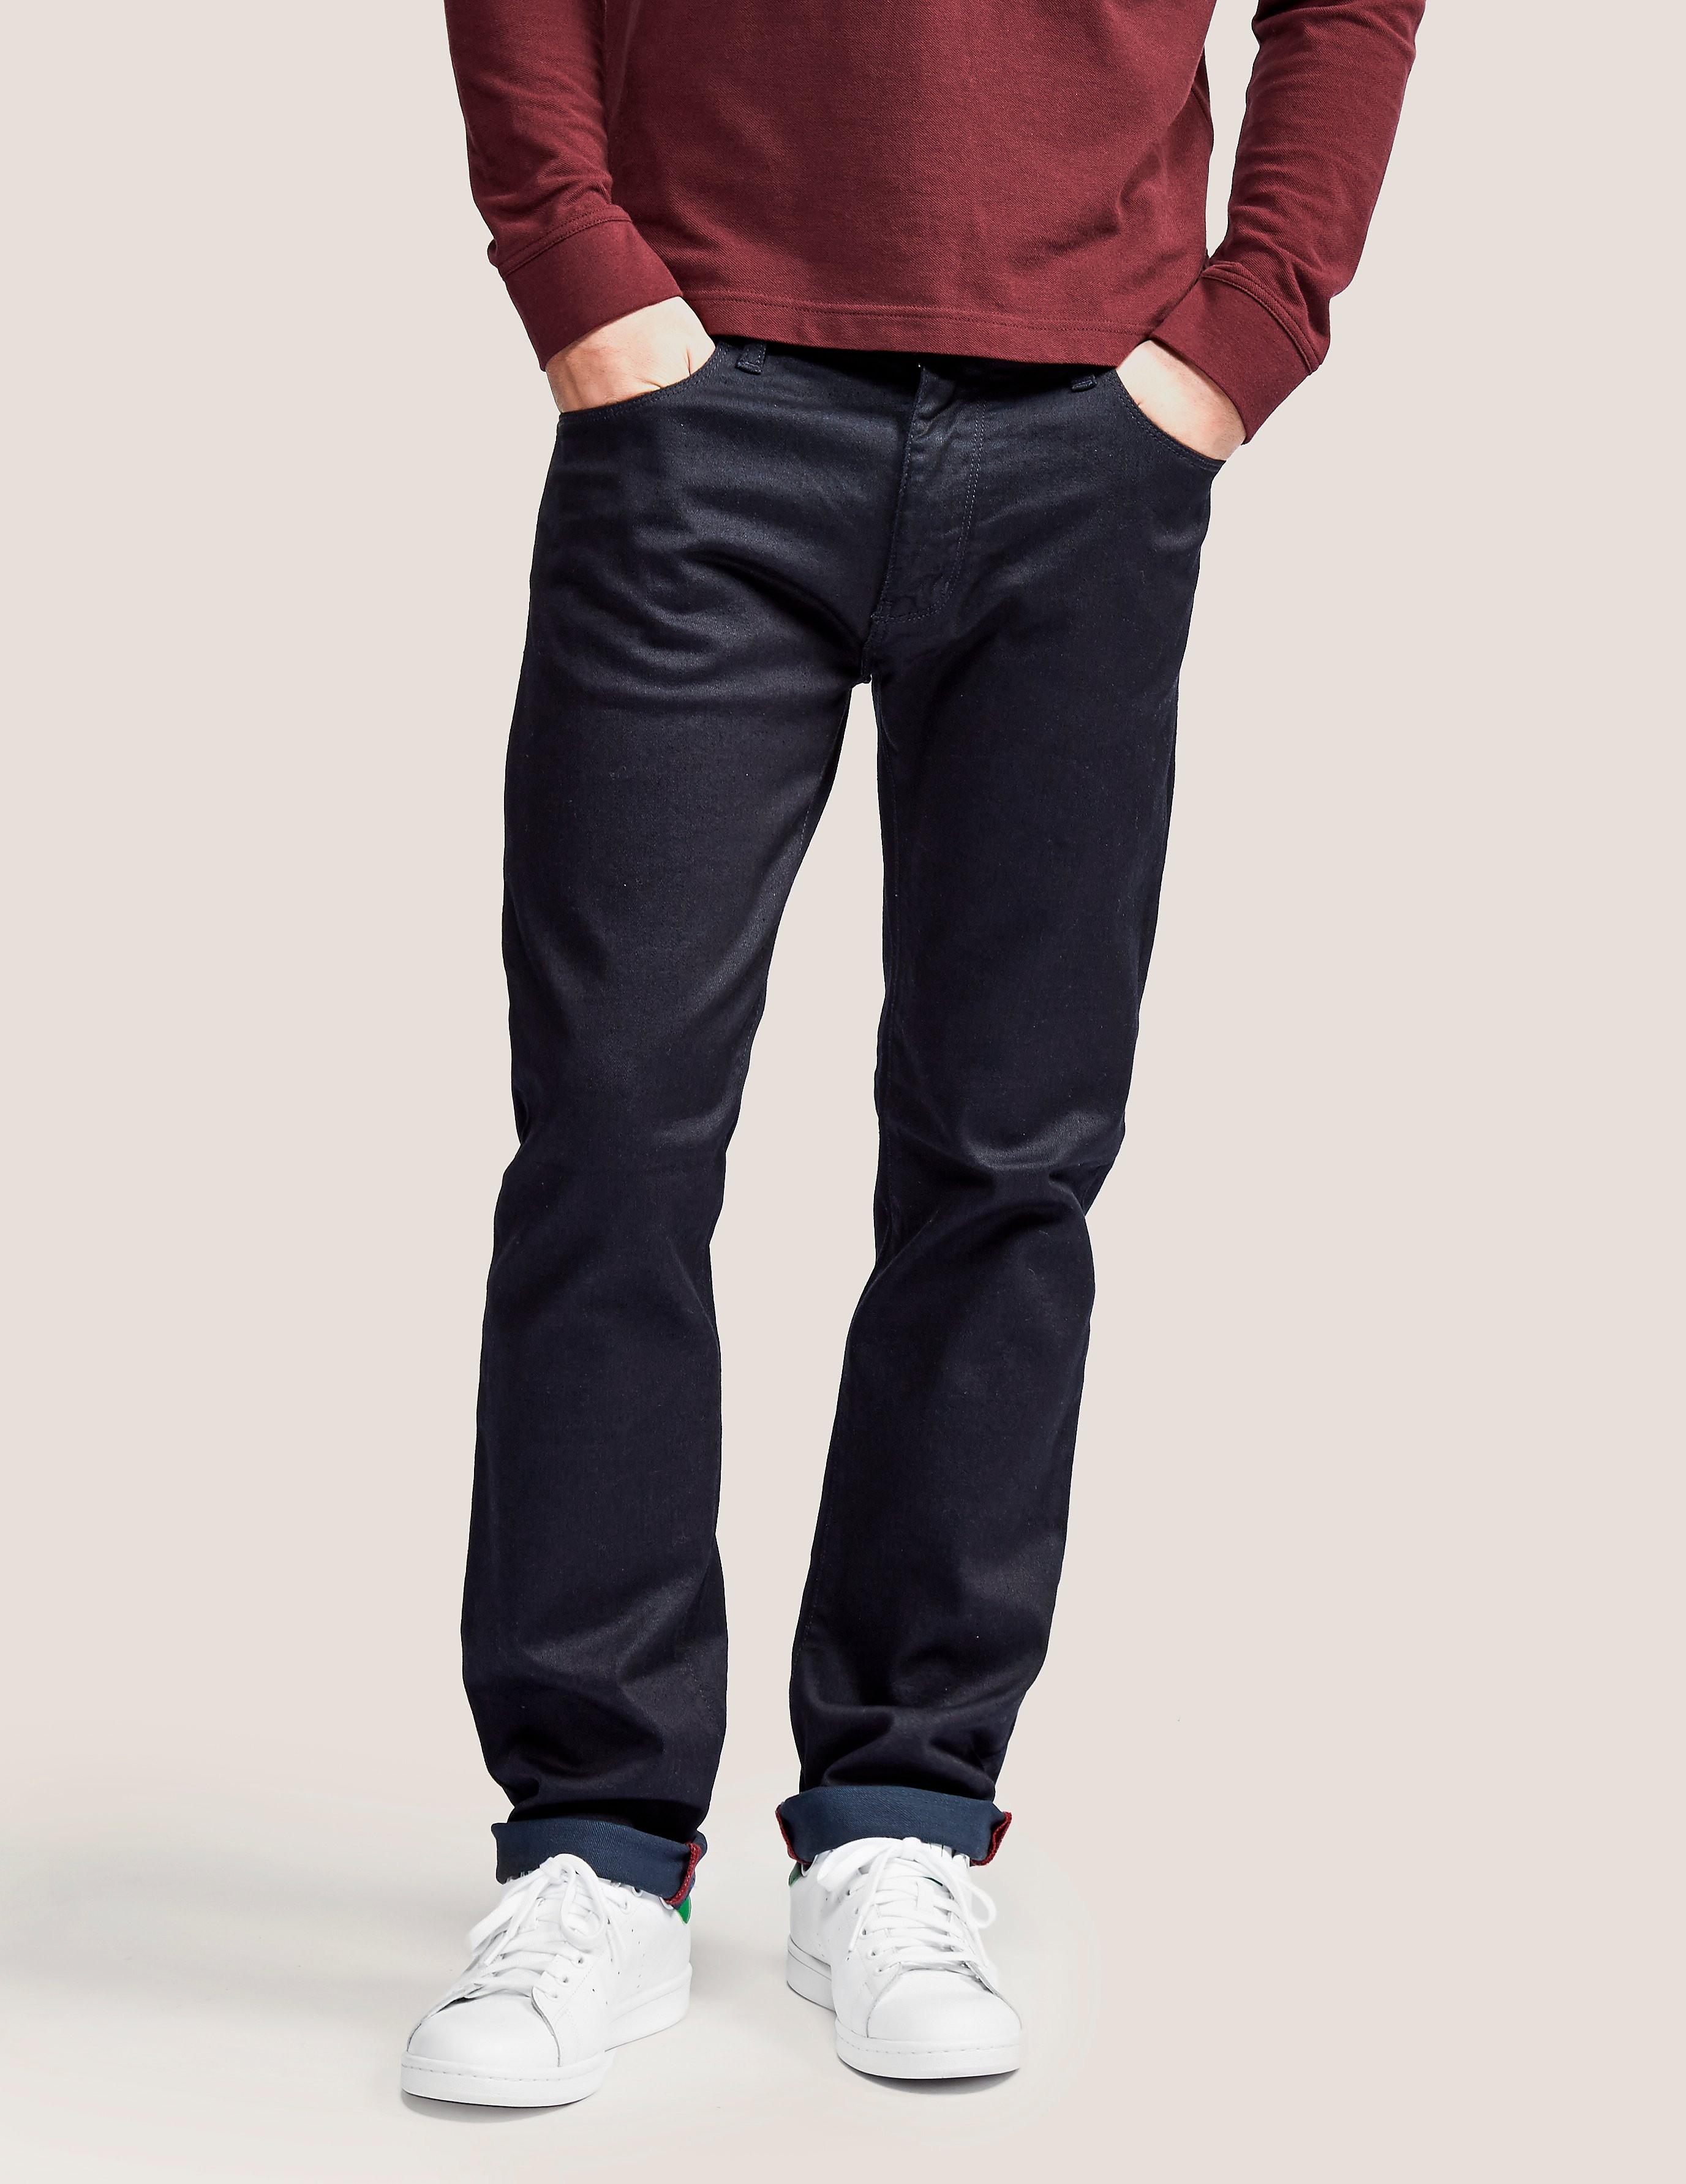 Armani Jeans J45 Ovedye Regular Fit Jeans